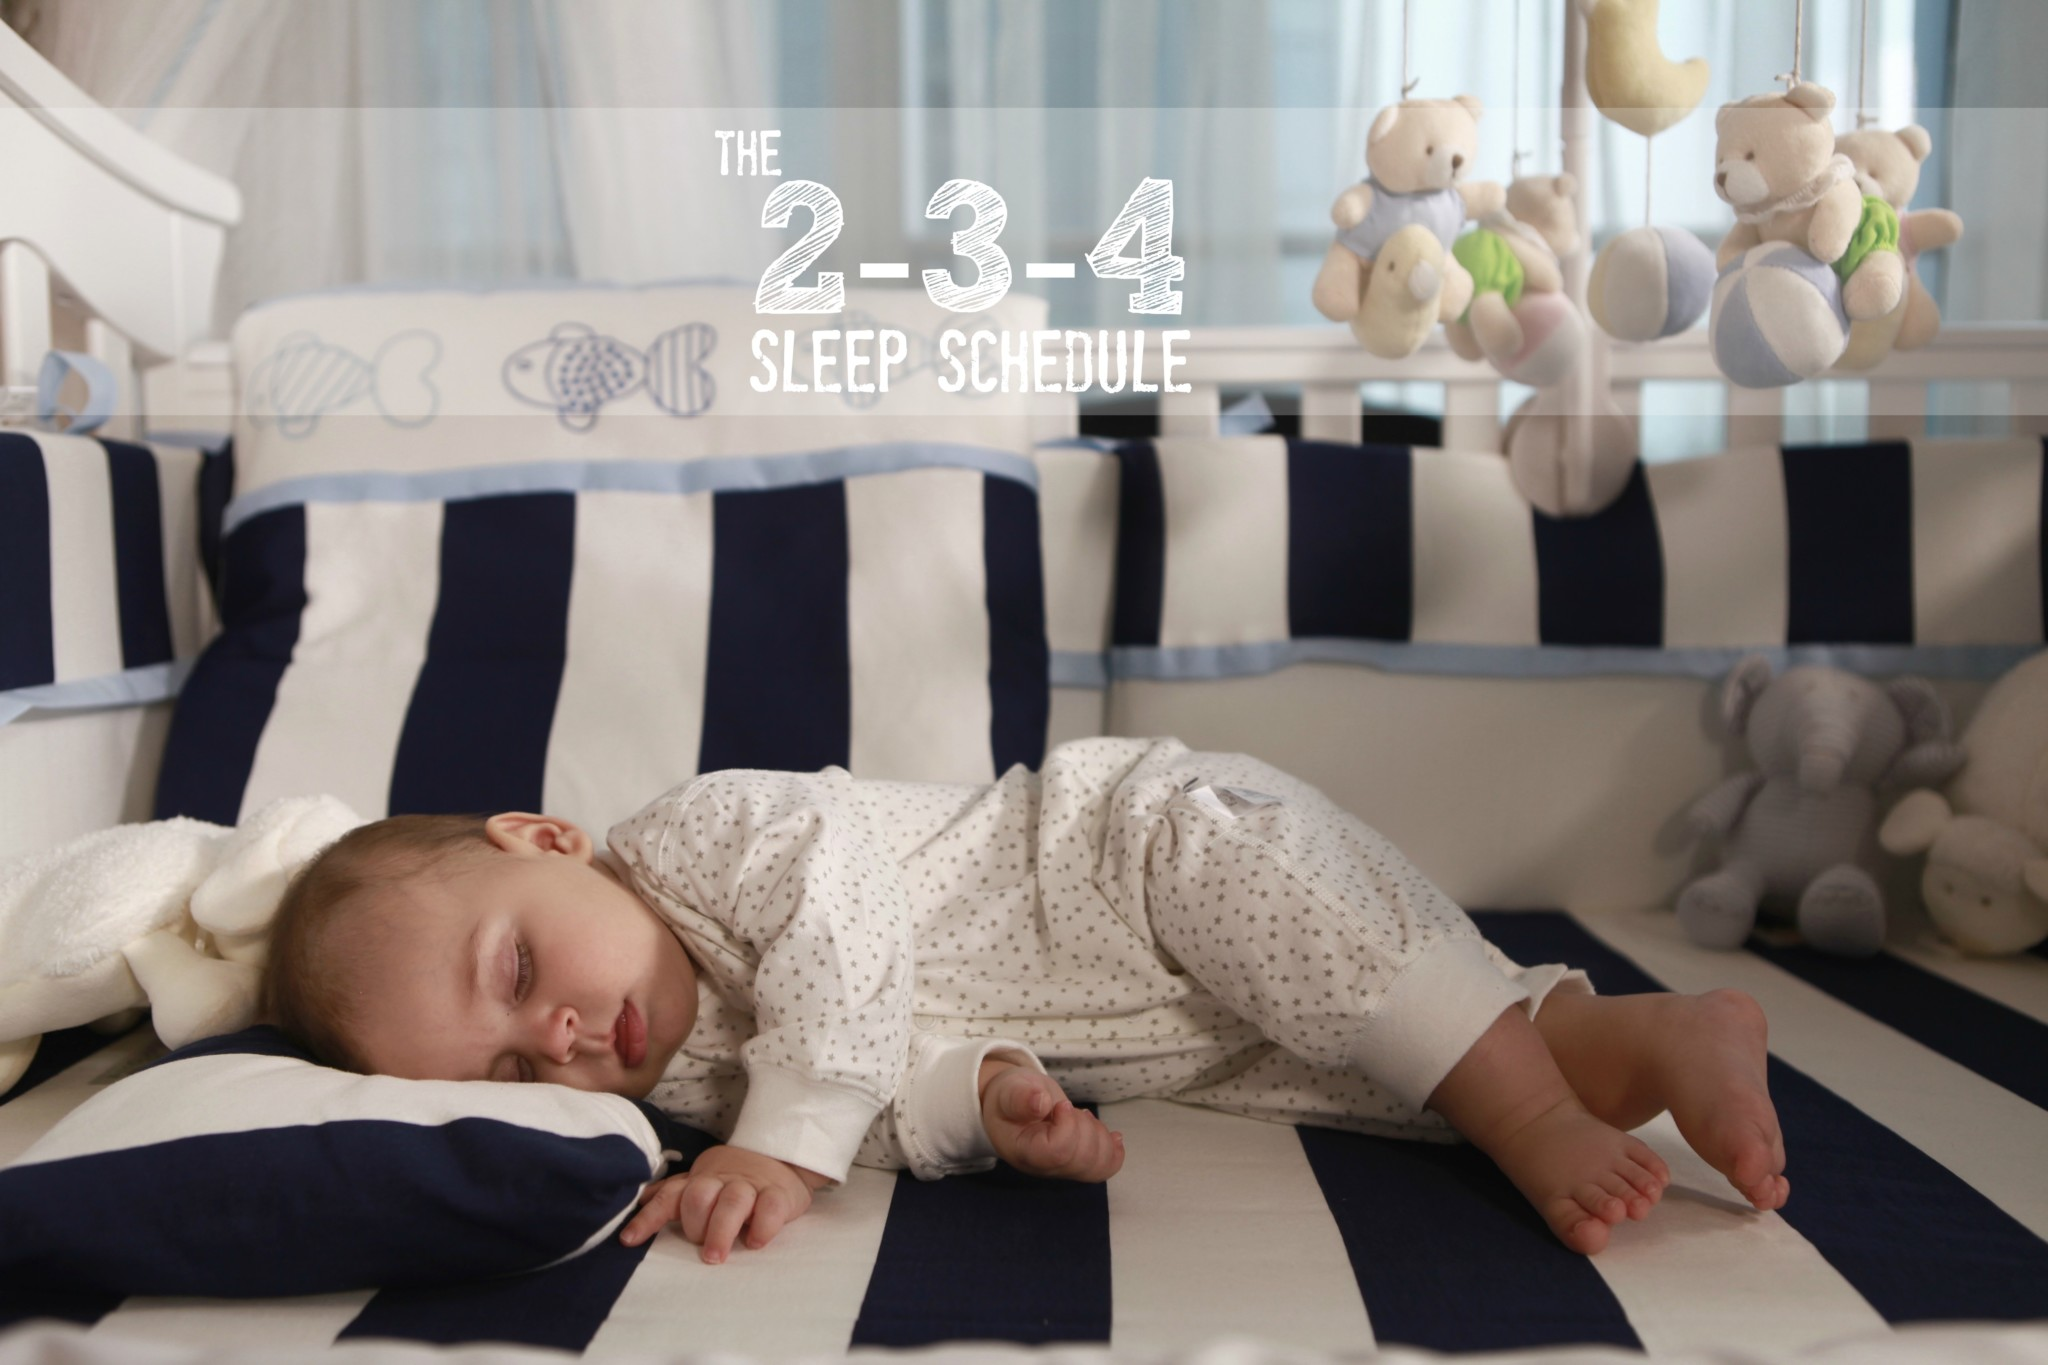 234 sleep